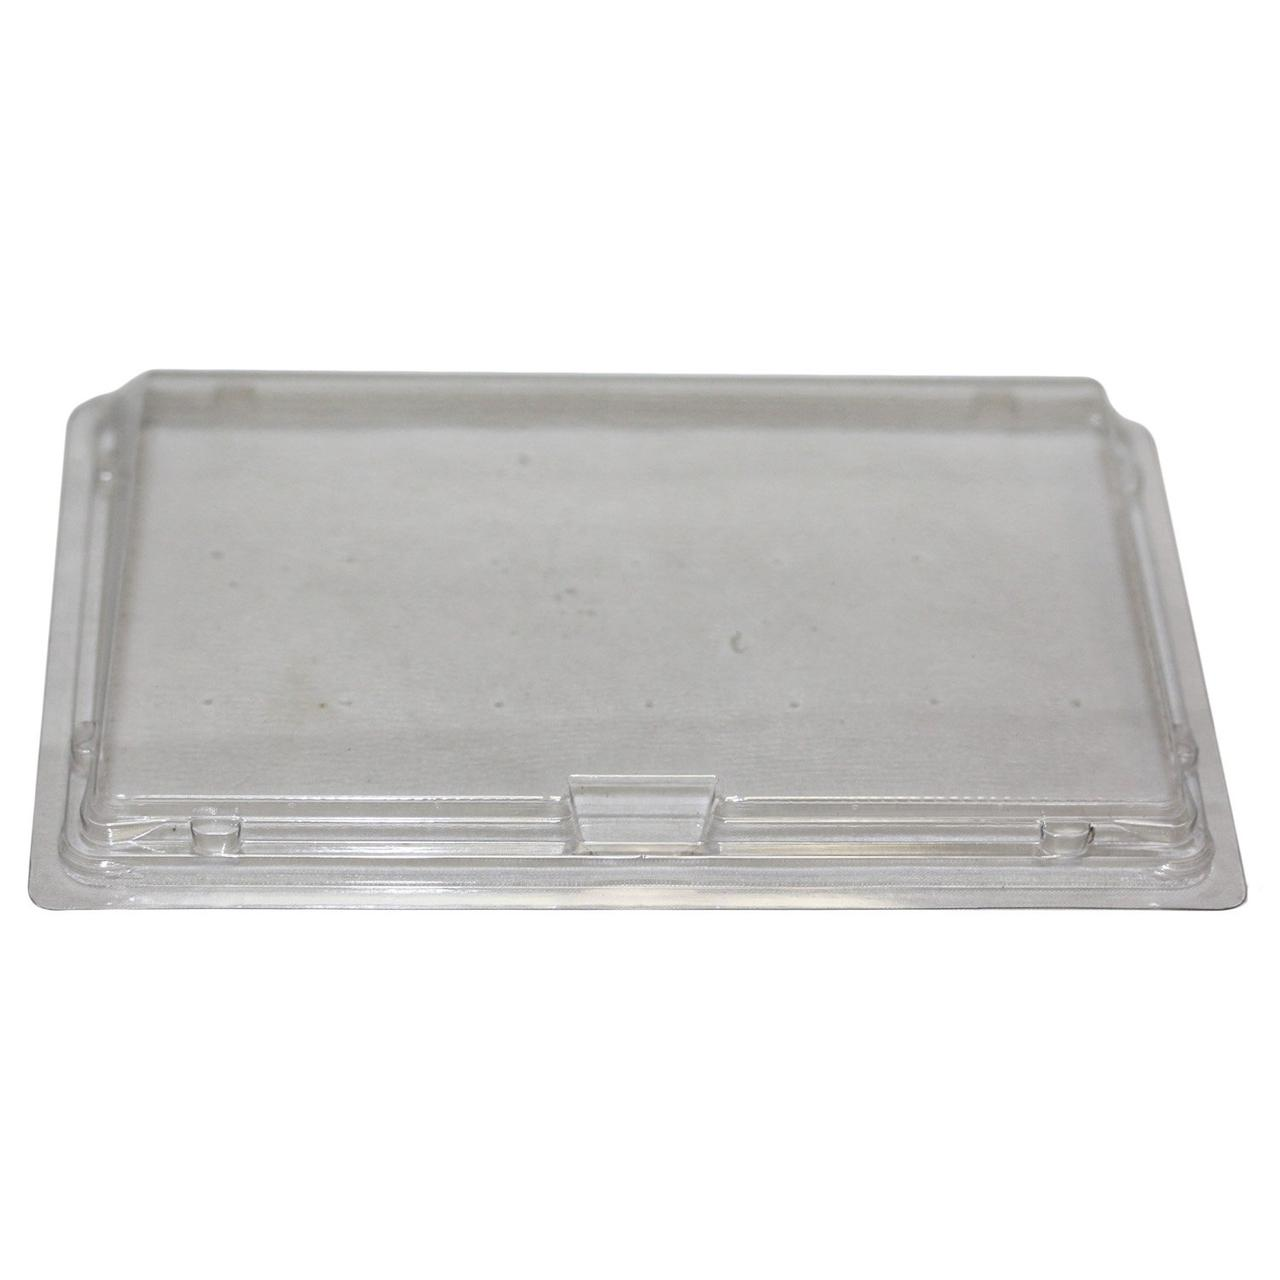 Крышка контейнера ДЛЯ СУШИ 183x128х32мм, прозрачная, ПЭТ,  СП-18К (витрина), 420 шт